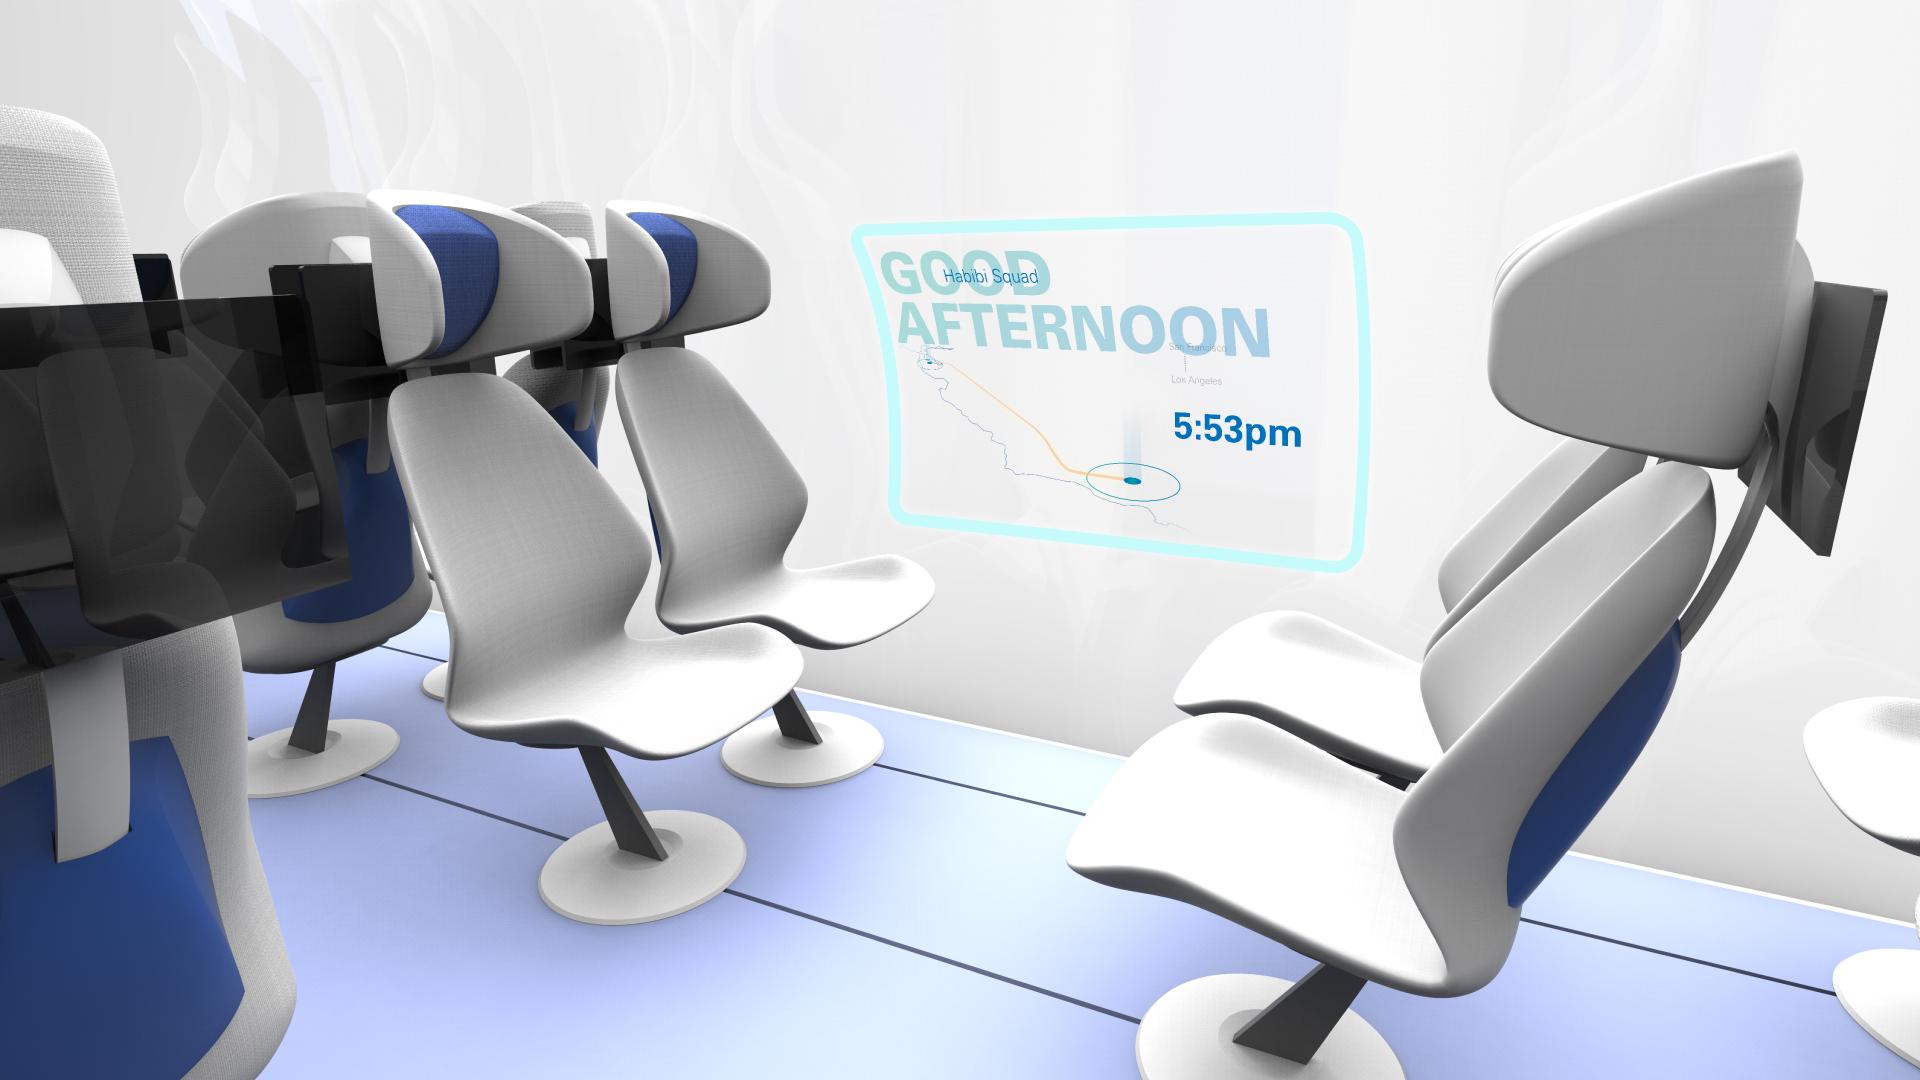 group-seat.jpg